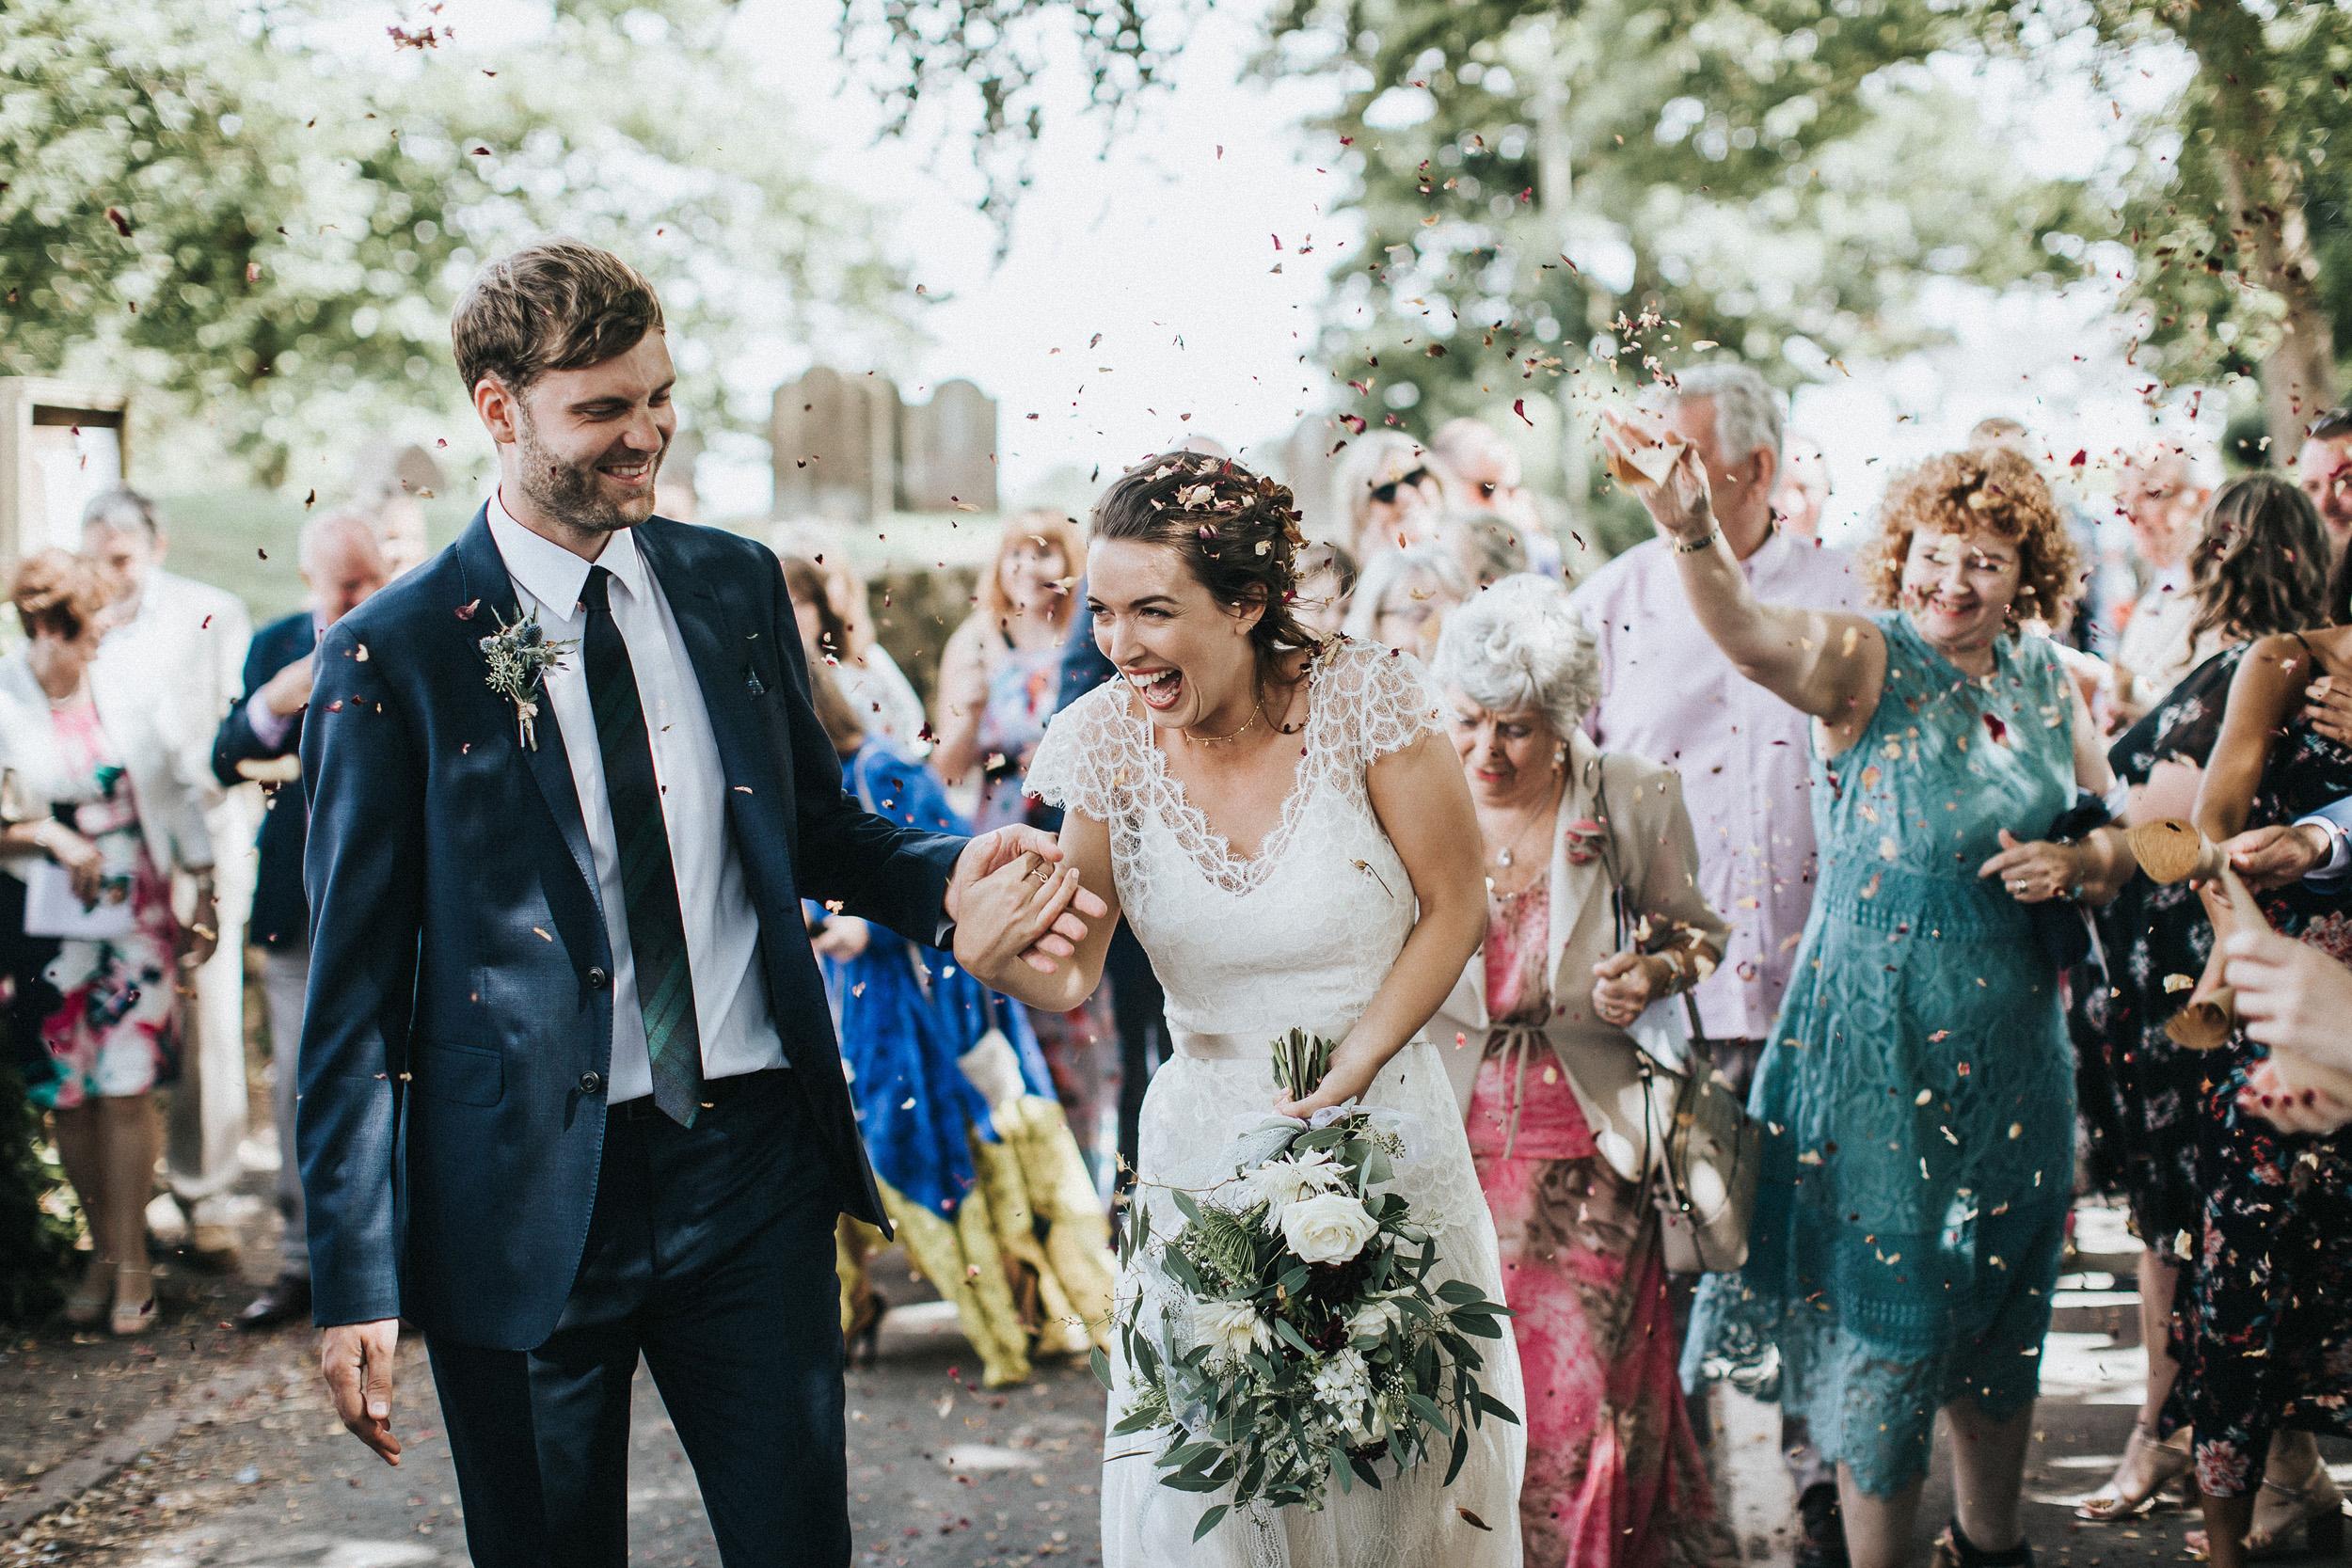 Martha-Laid-Back-Garden-Wedding-Lace-Wedding-Dress-Bohemian-Kate-Beaumont-24.jpg